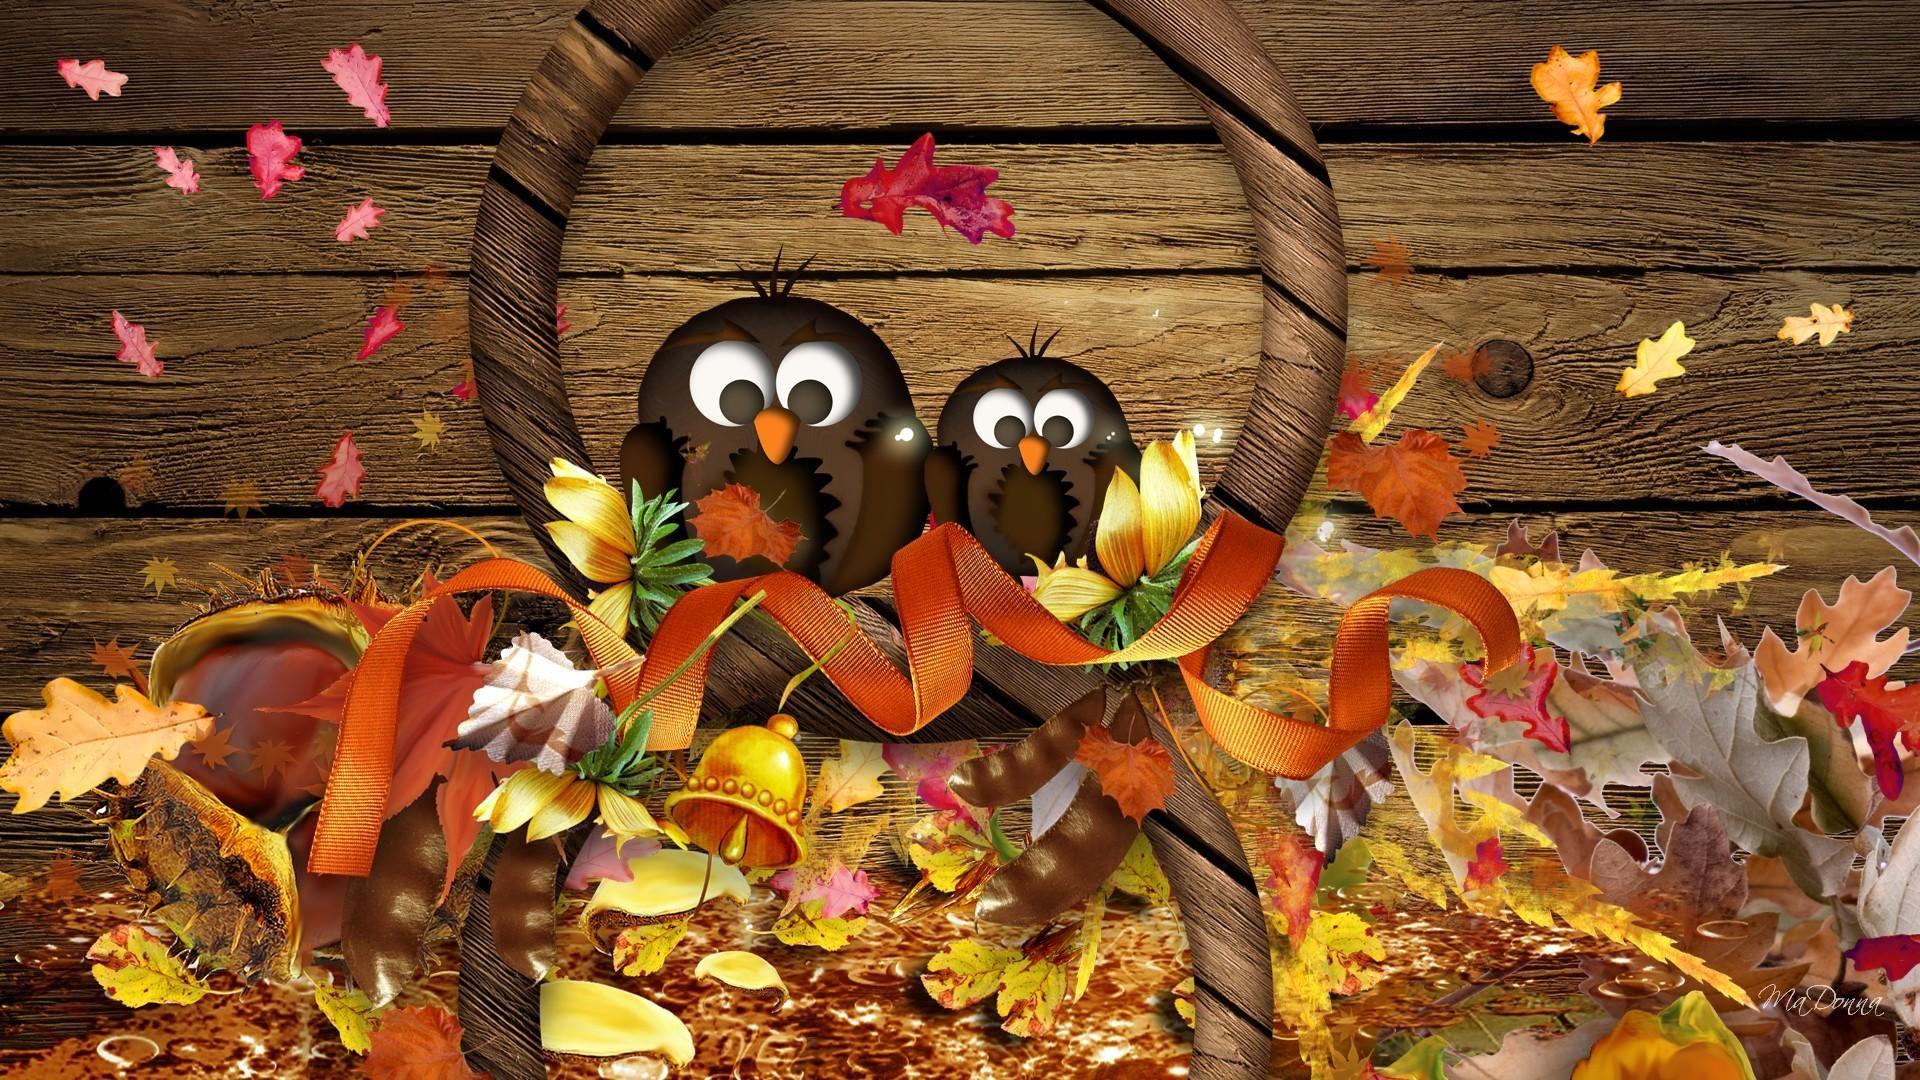 Cute Thanksgiving Screensavers Thanksgiving Hd Desktop Wallpapers For Thanksgiving Wallpaper Thanksgiving Background Free Thanksgiving Wallpaper